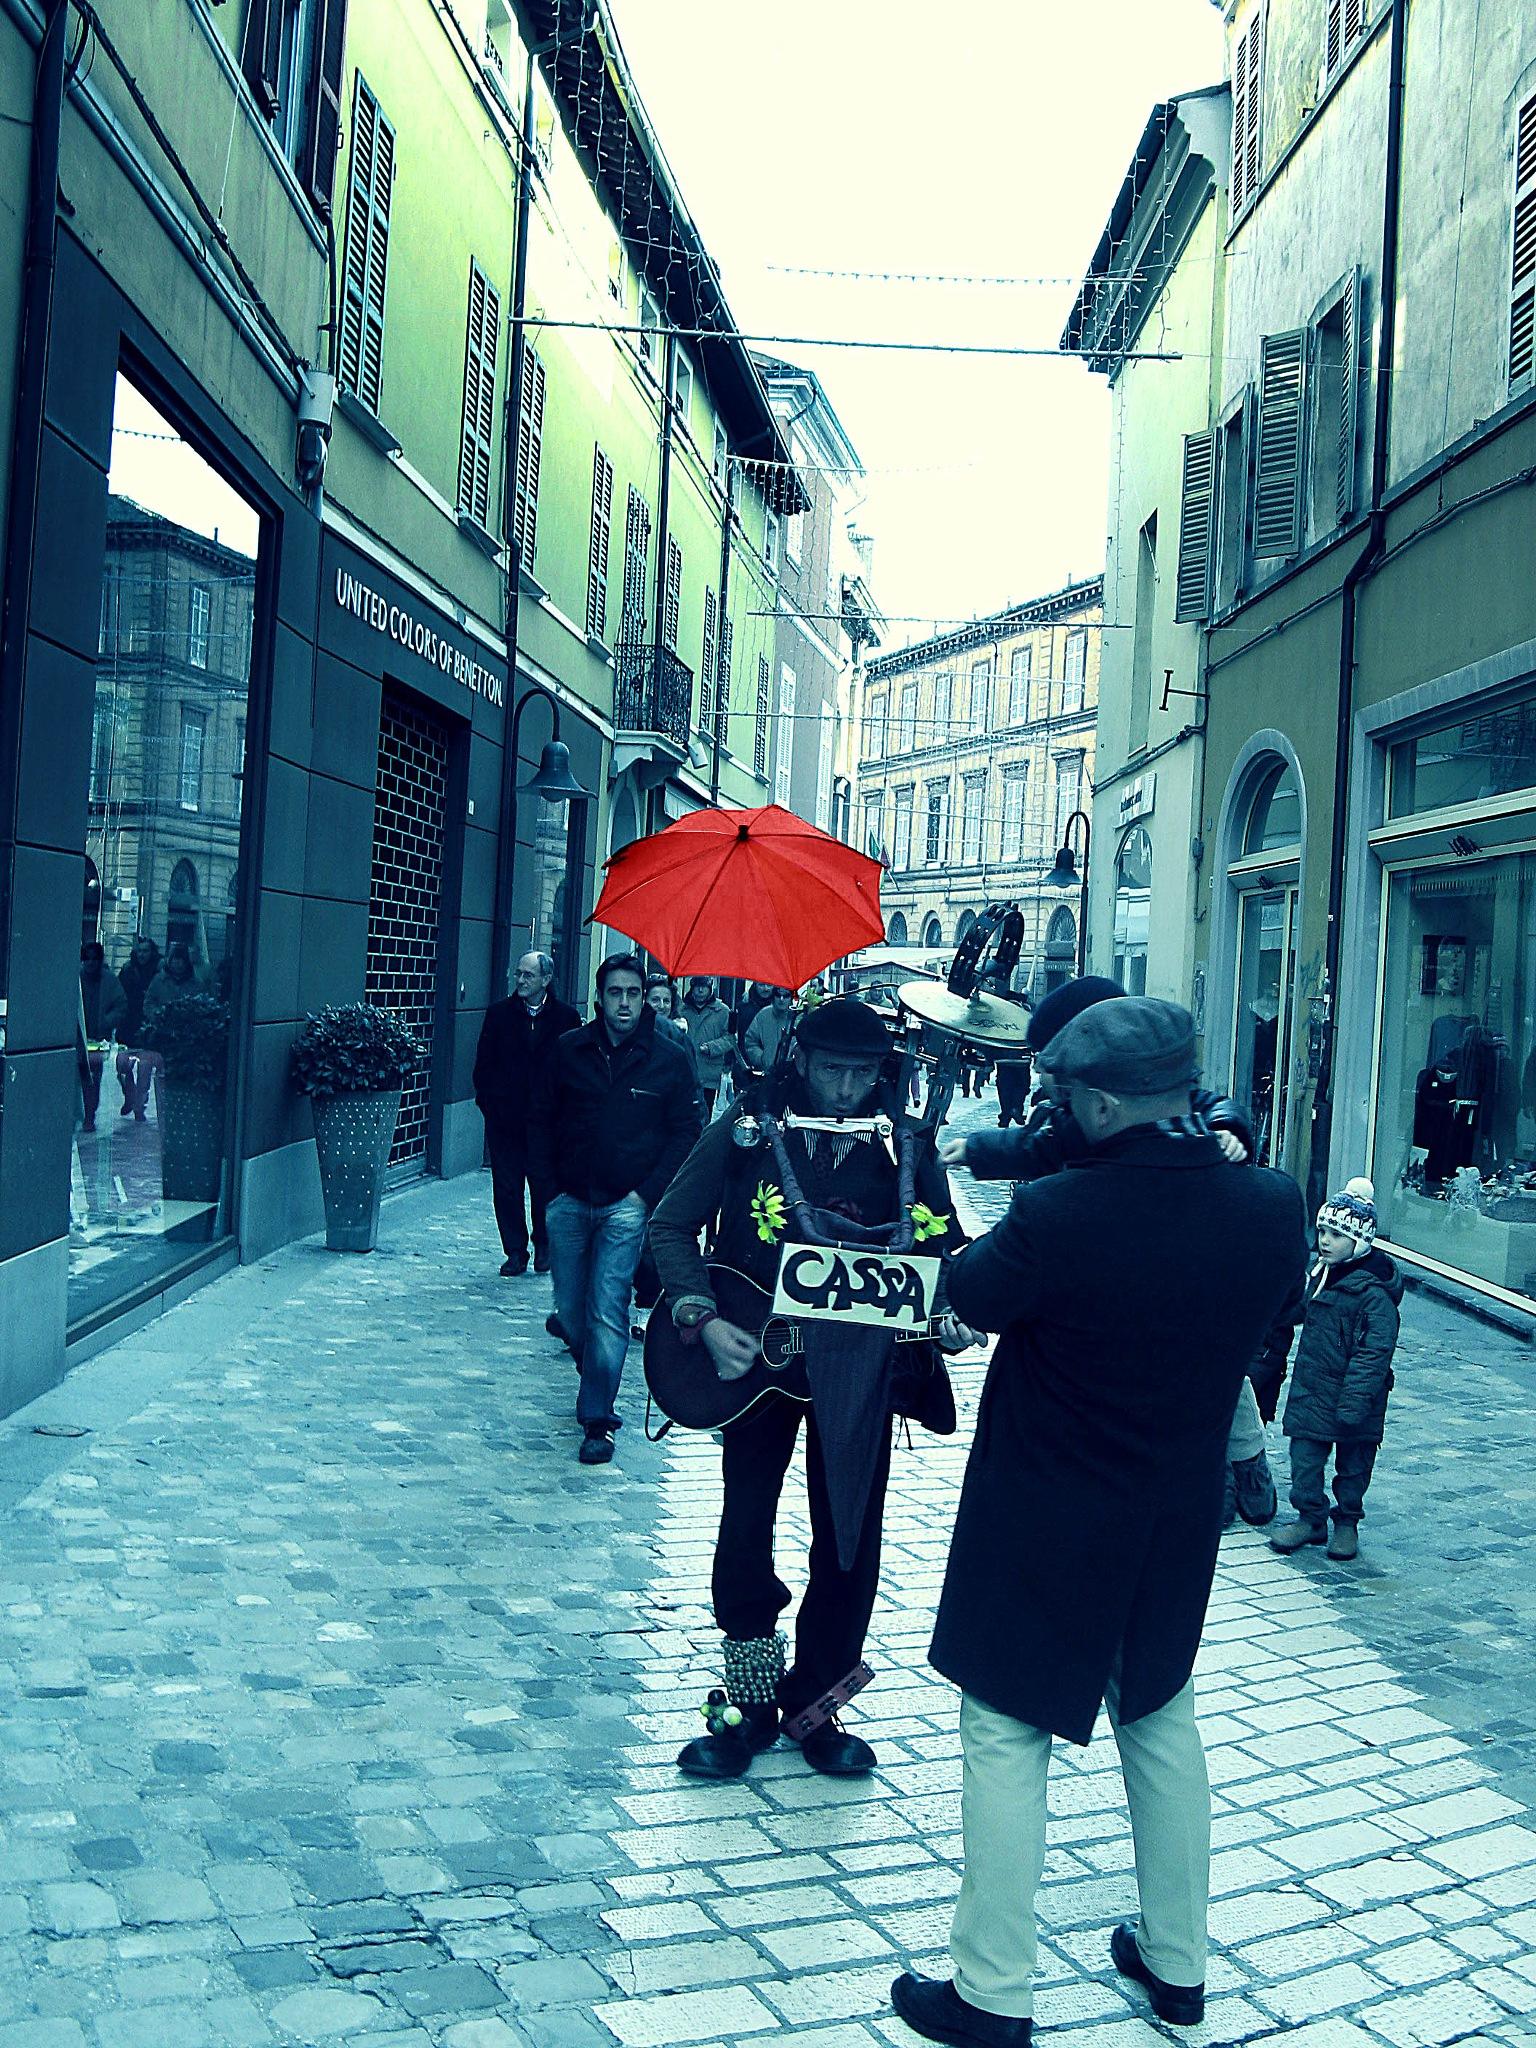 Musicista di strada2 by sreten nakićenović